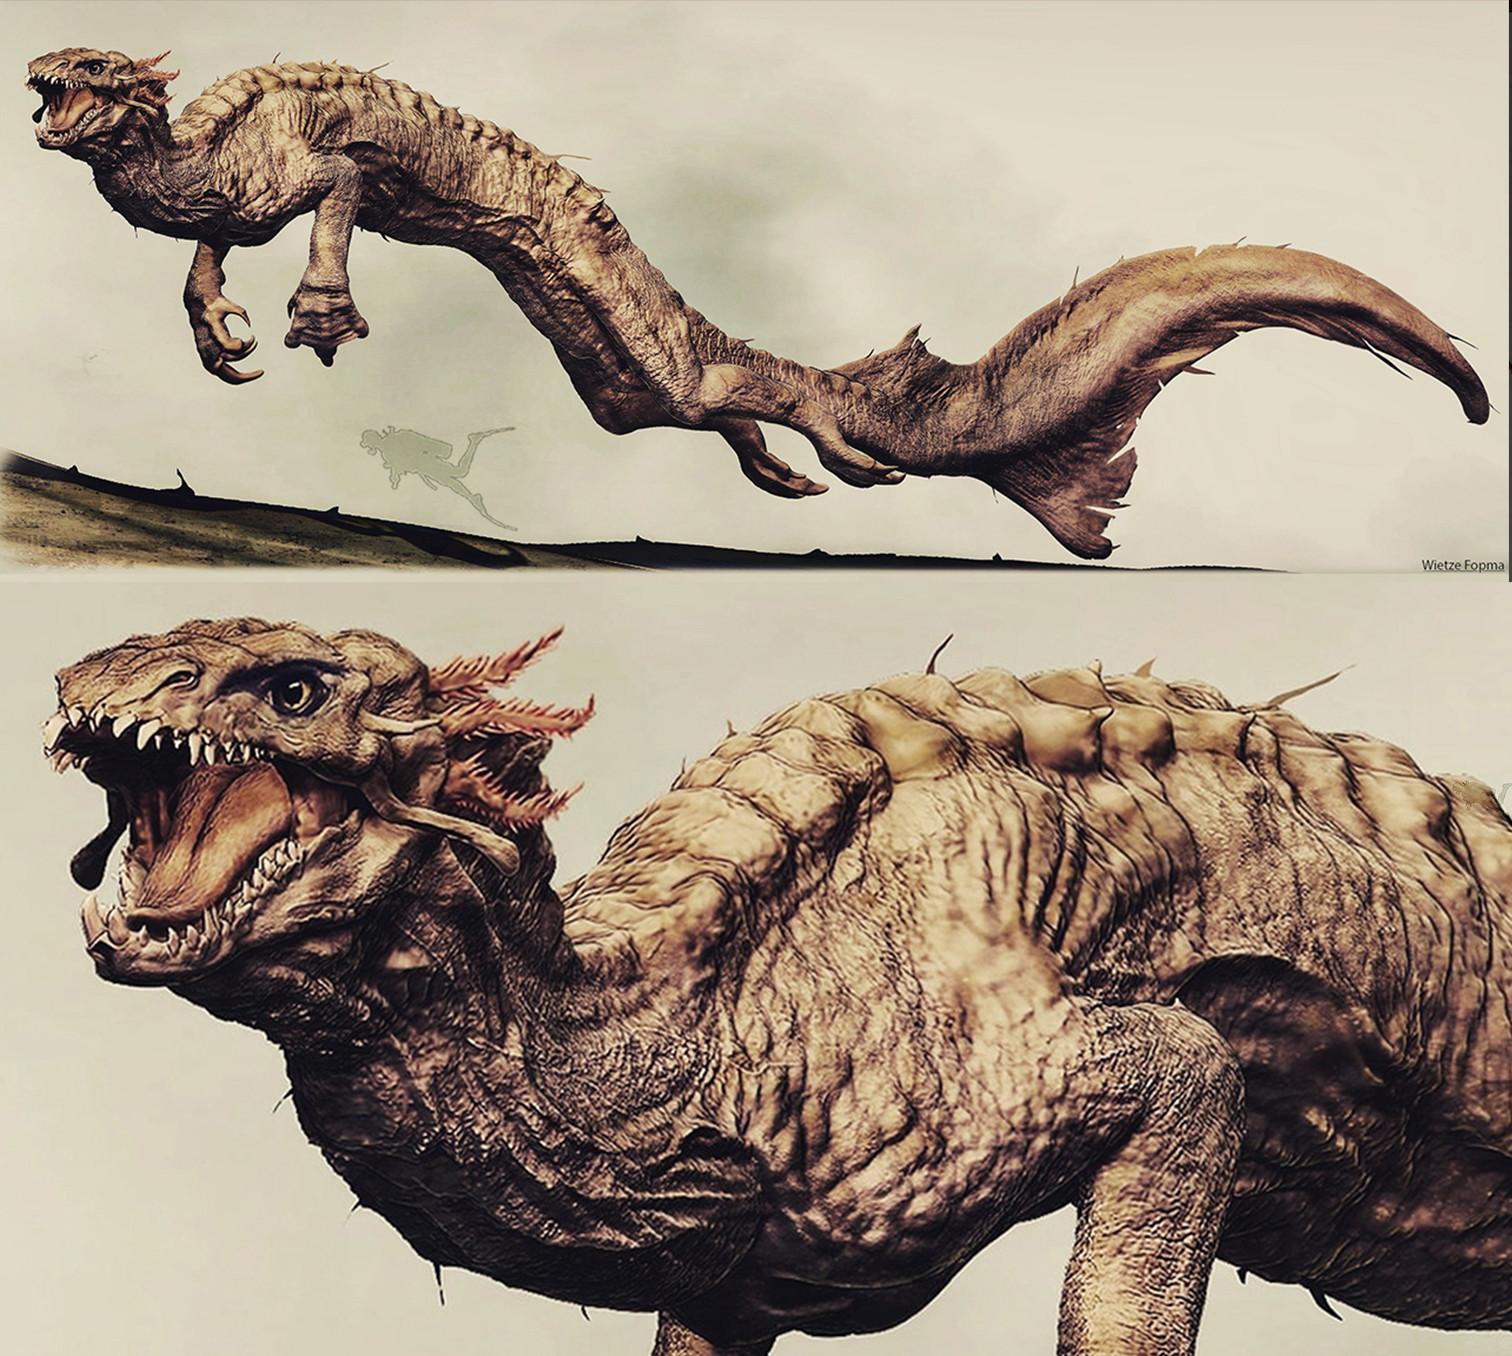 Wietze fopma rough water dragons2 finl